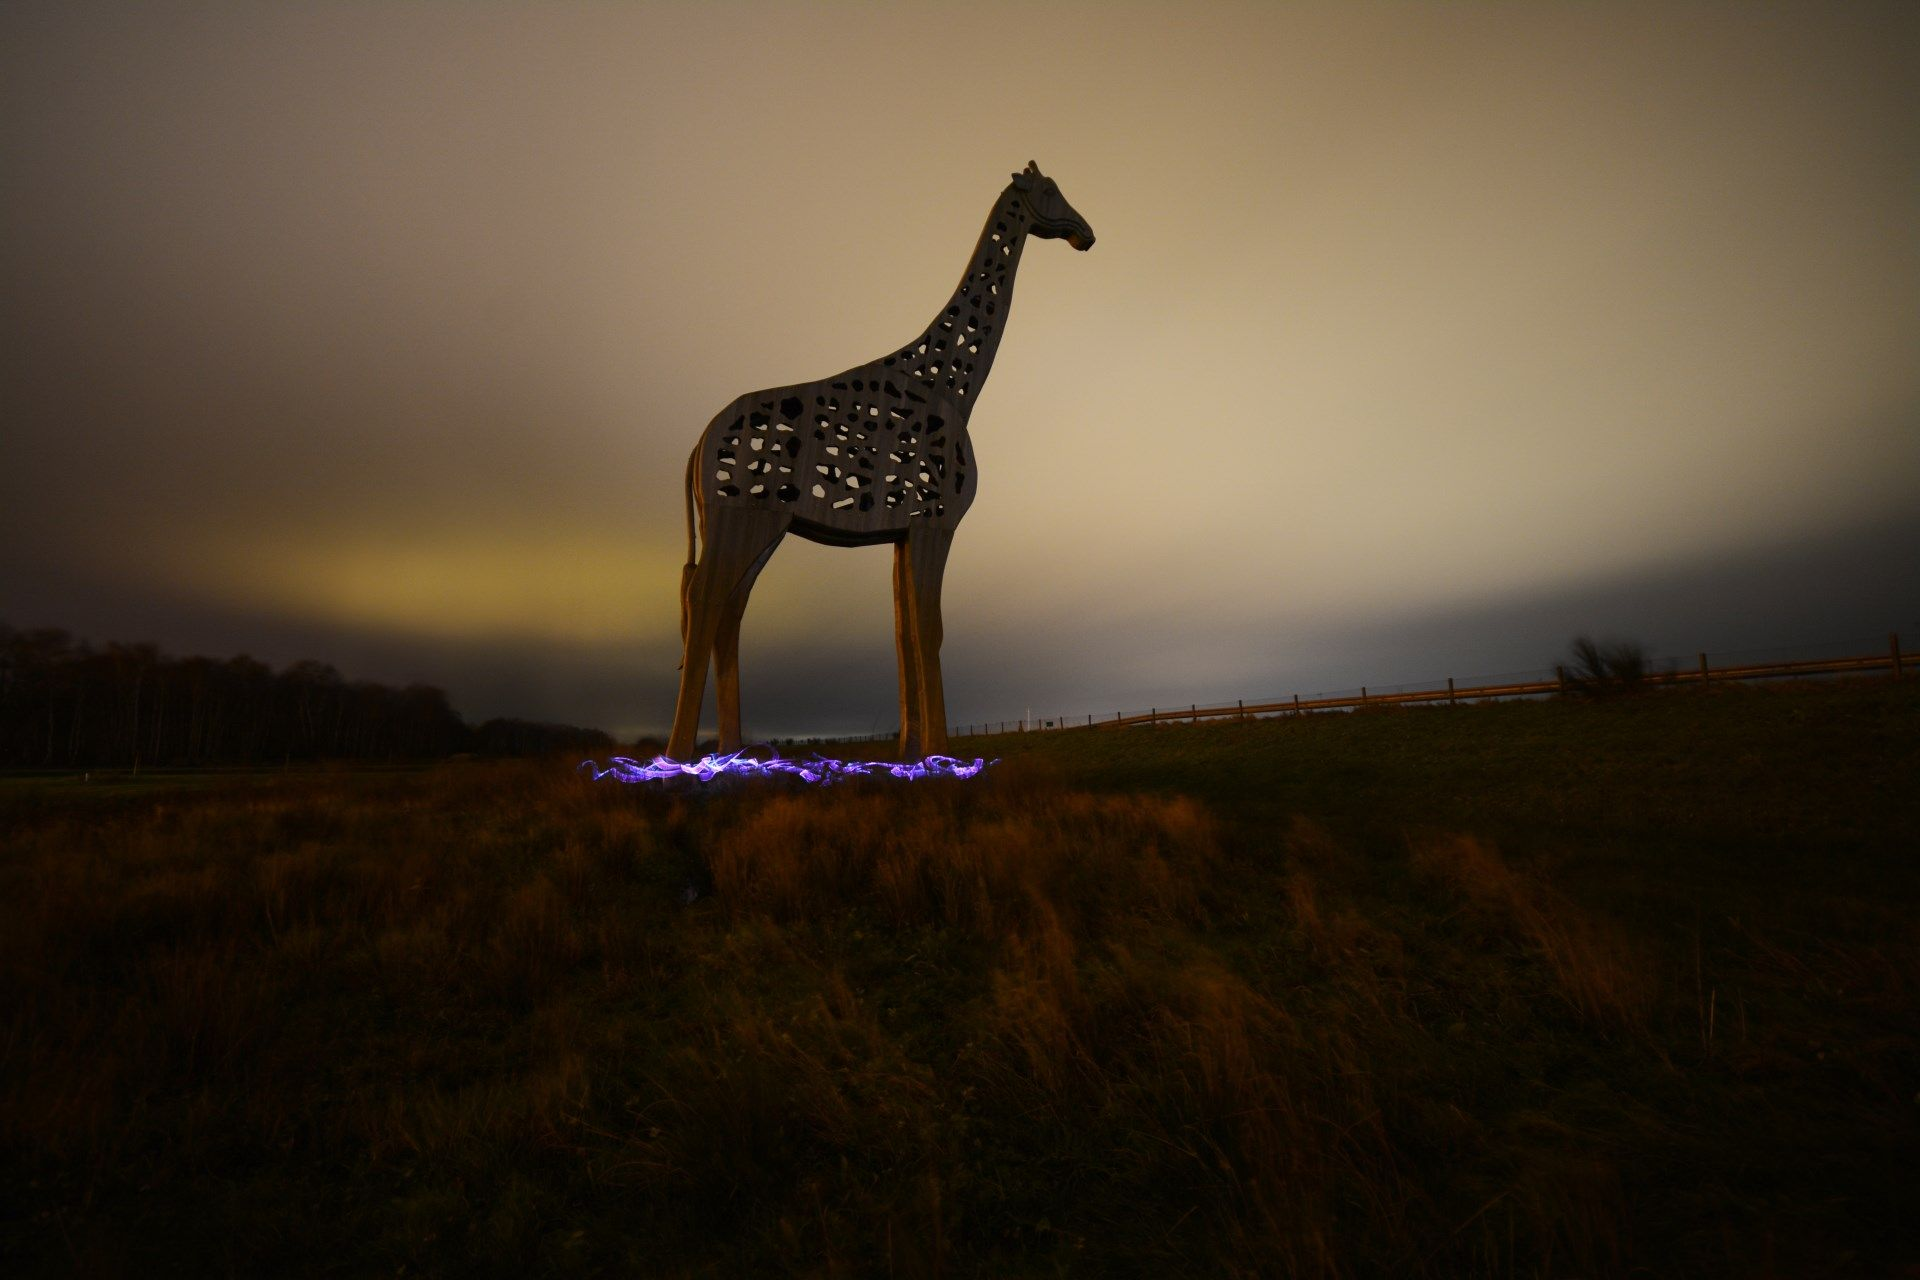 Jasper Geenhuizen - light graffiti - lightgraffiti.nl